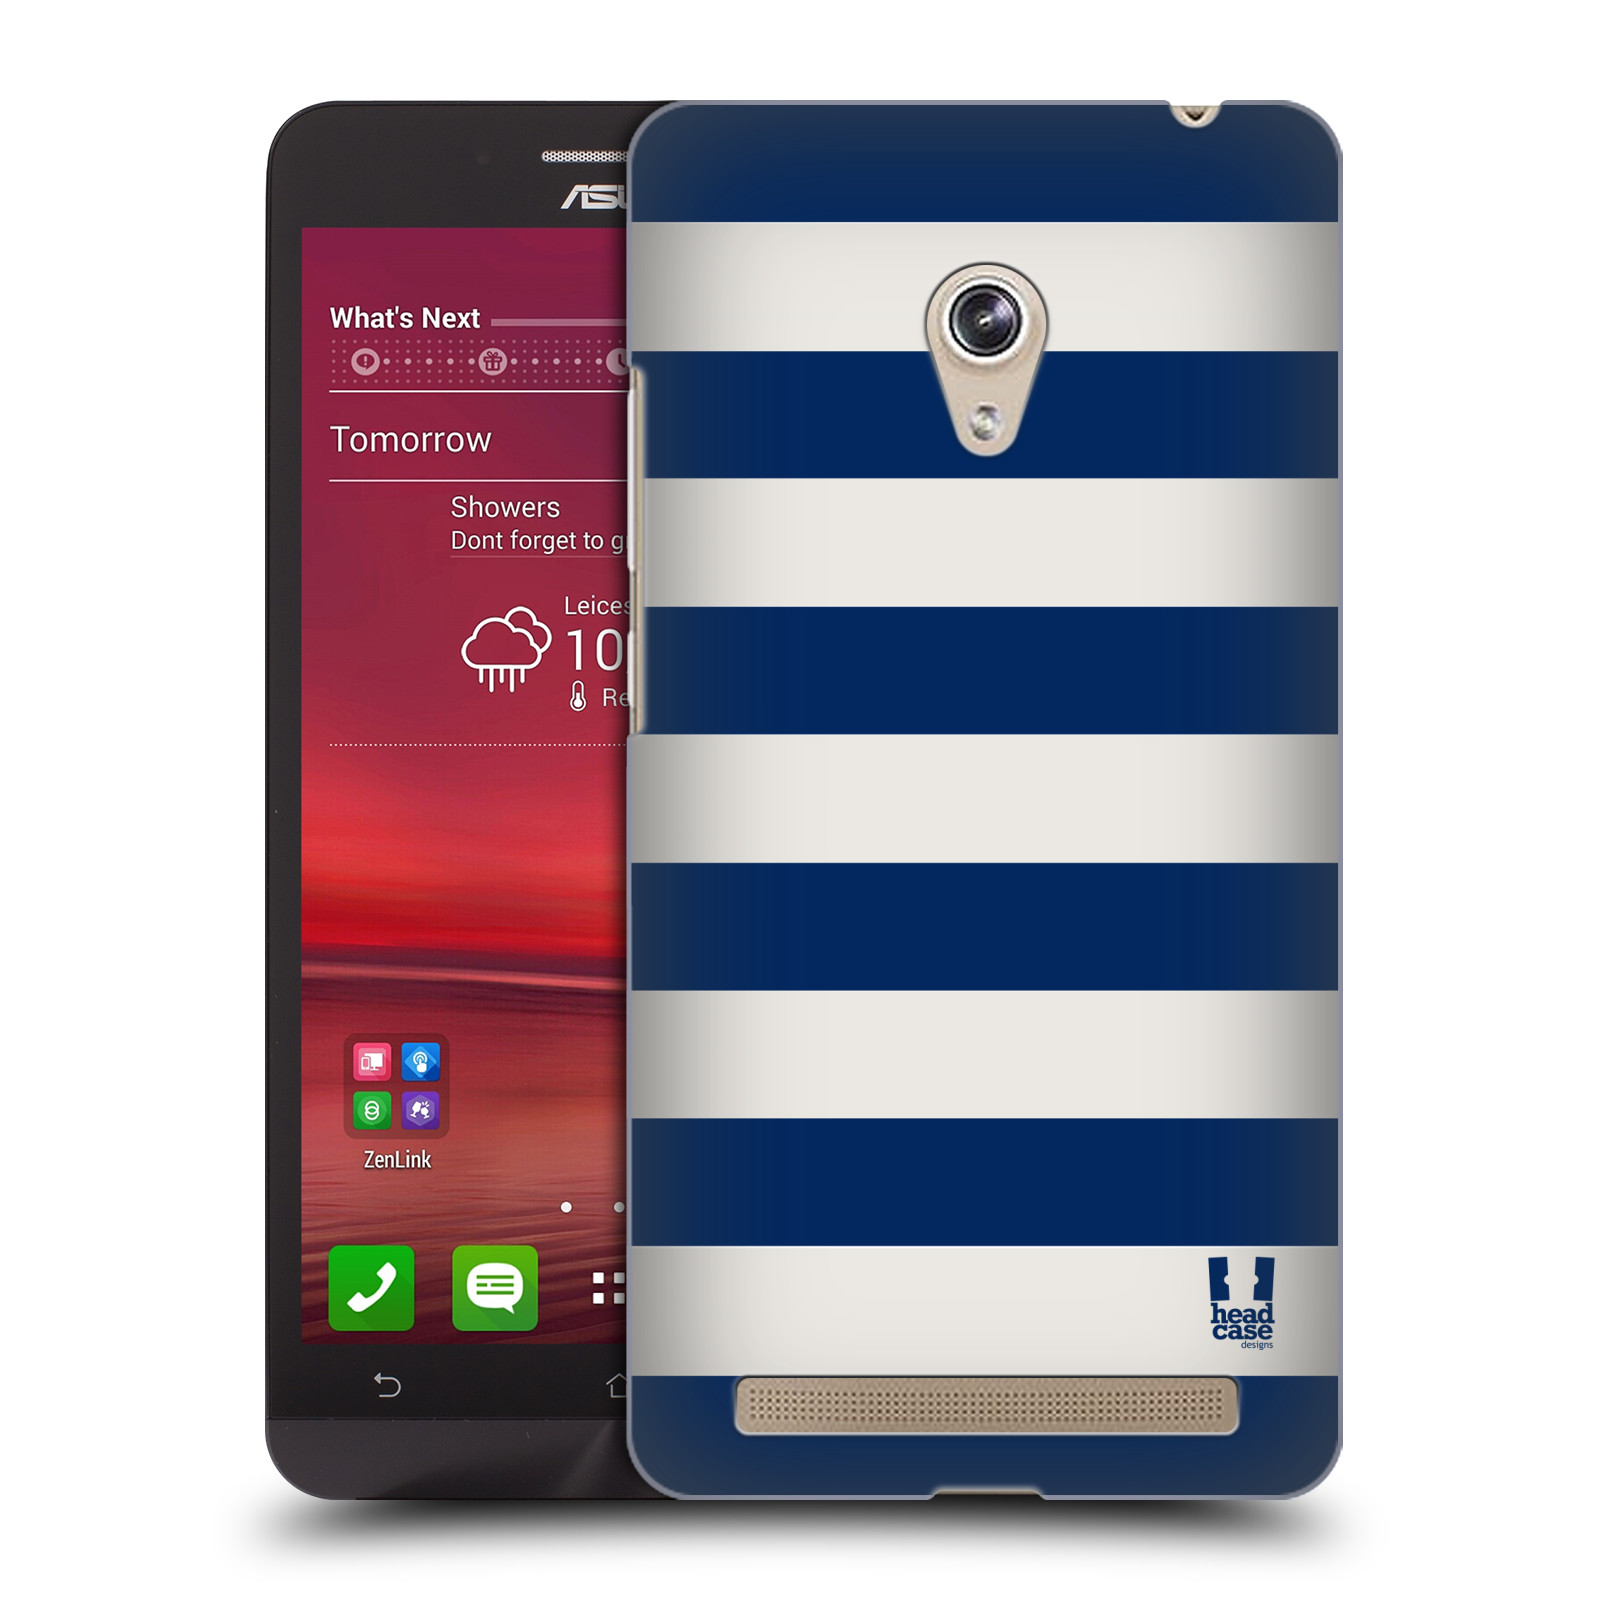 HEAD CASE plastový obal na mobil Asus Zenfone 6 vzor Barevné proužky MODRÁ A BÍLÁ NÁMOŘNÍK